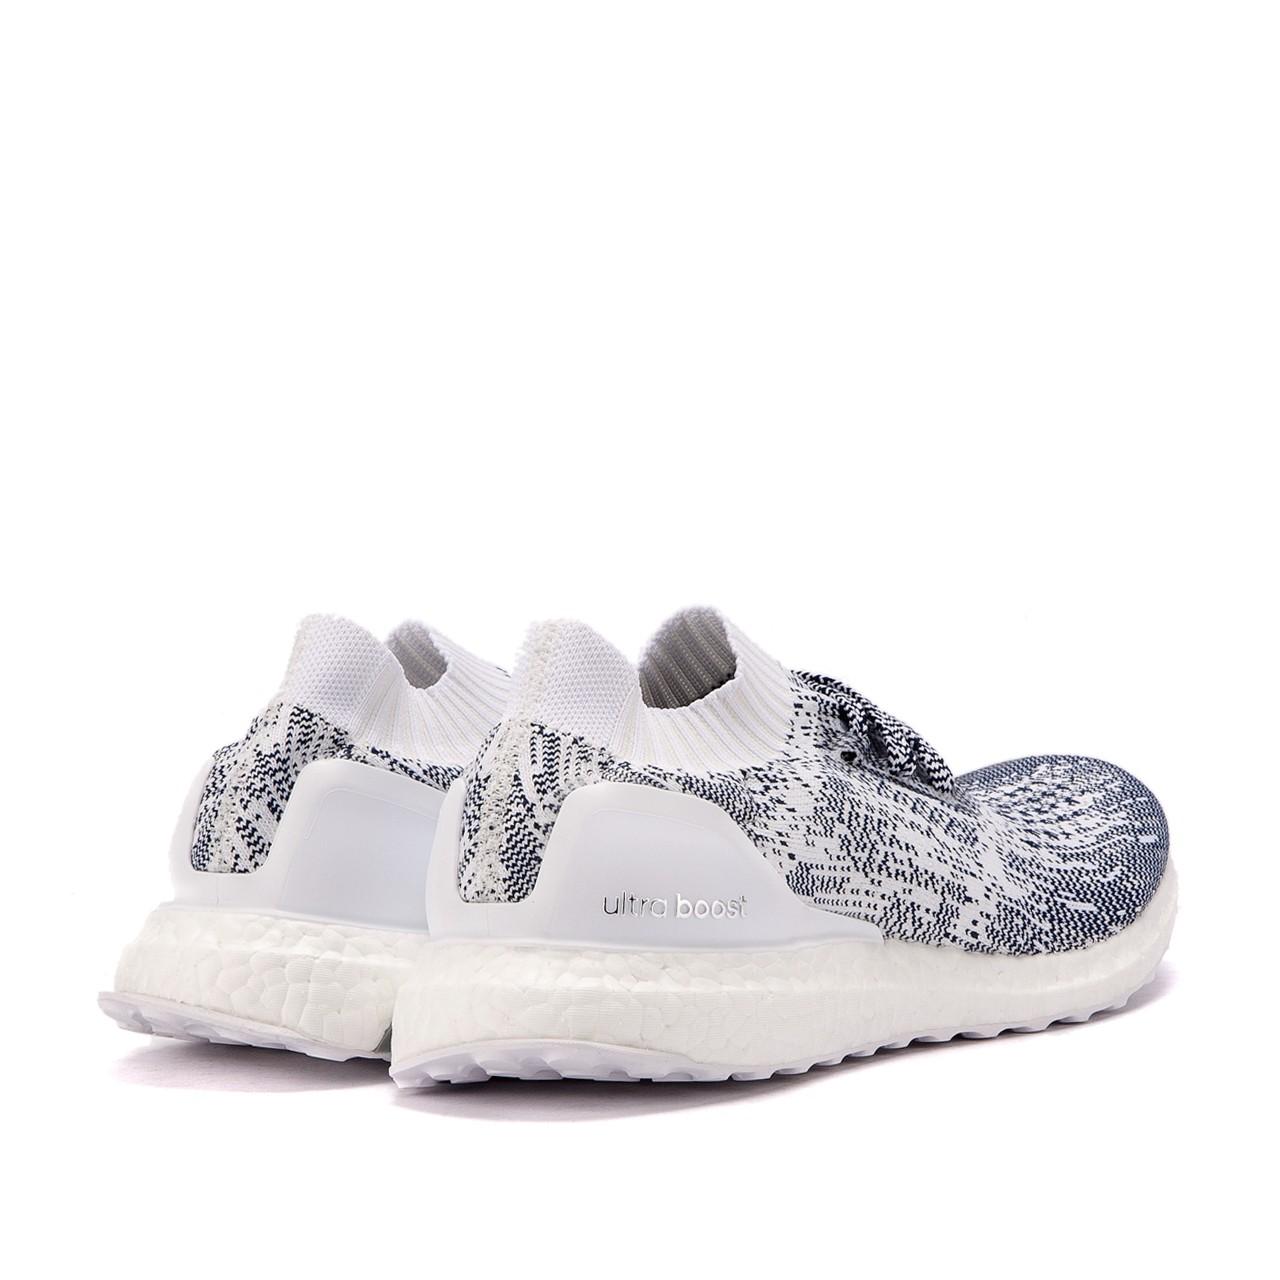 adidas-ultraboost-uncaged-oreo-4